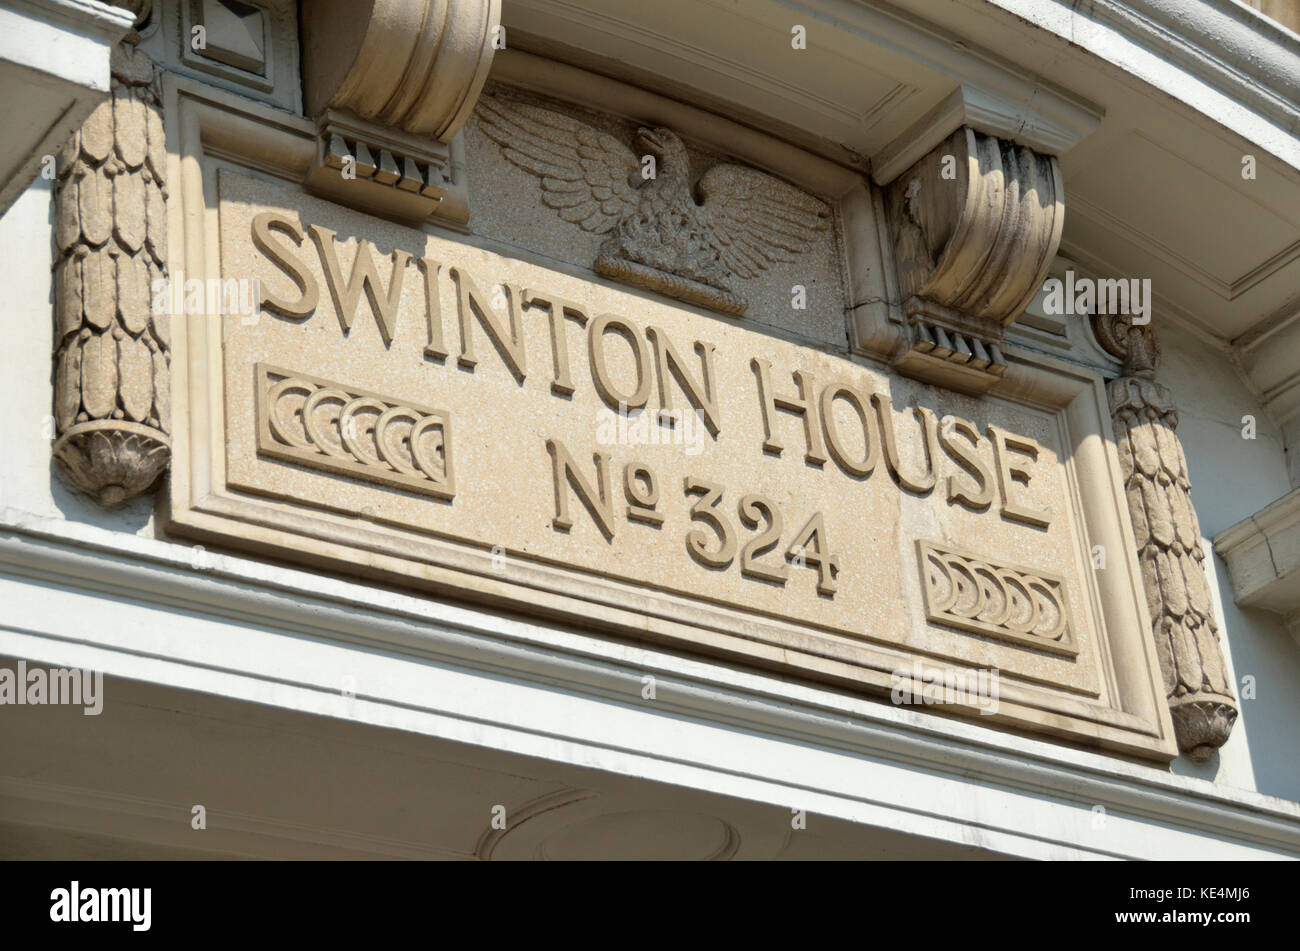 Swinton House in Gray's Inn Road, King's Cross, London, UK. - Stock Image